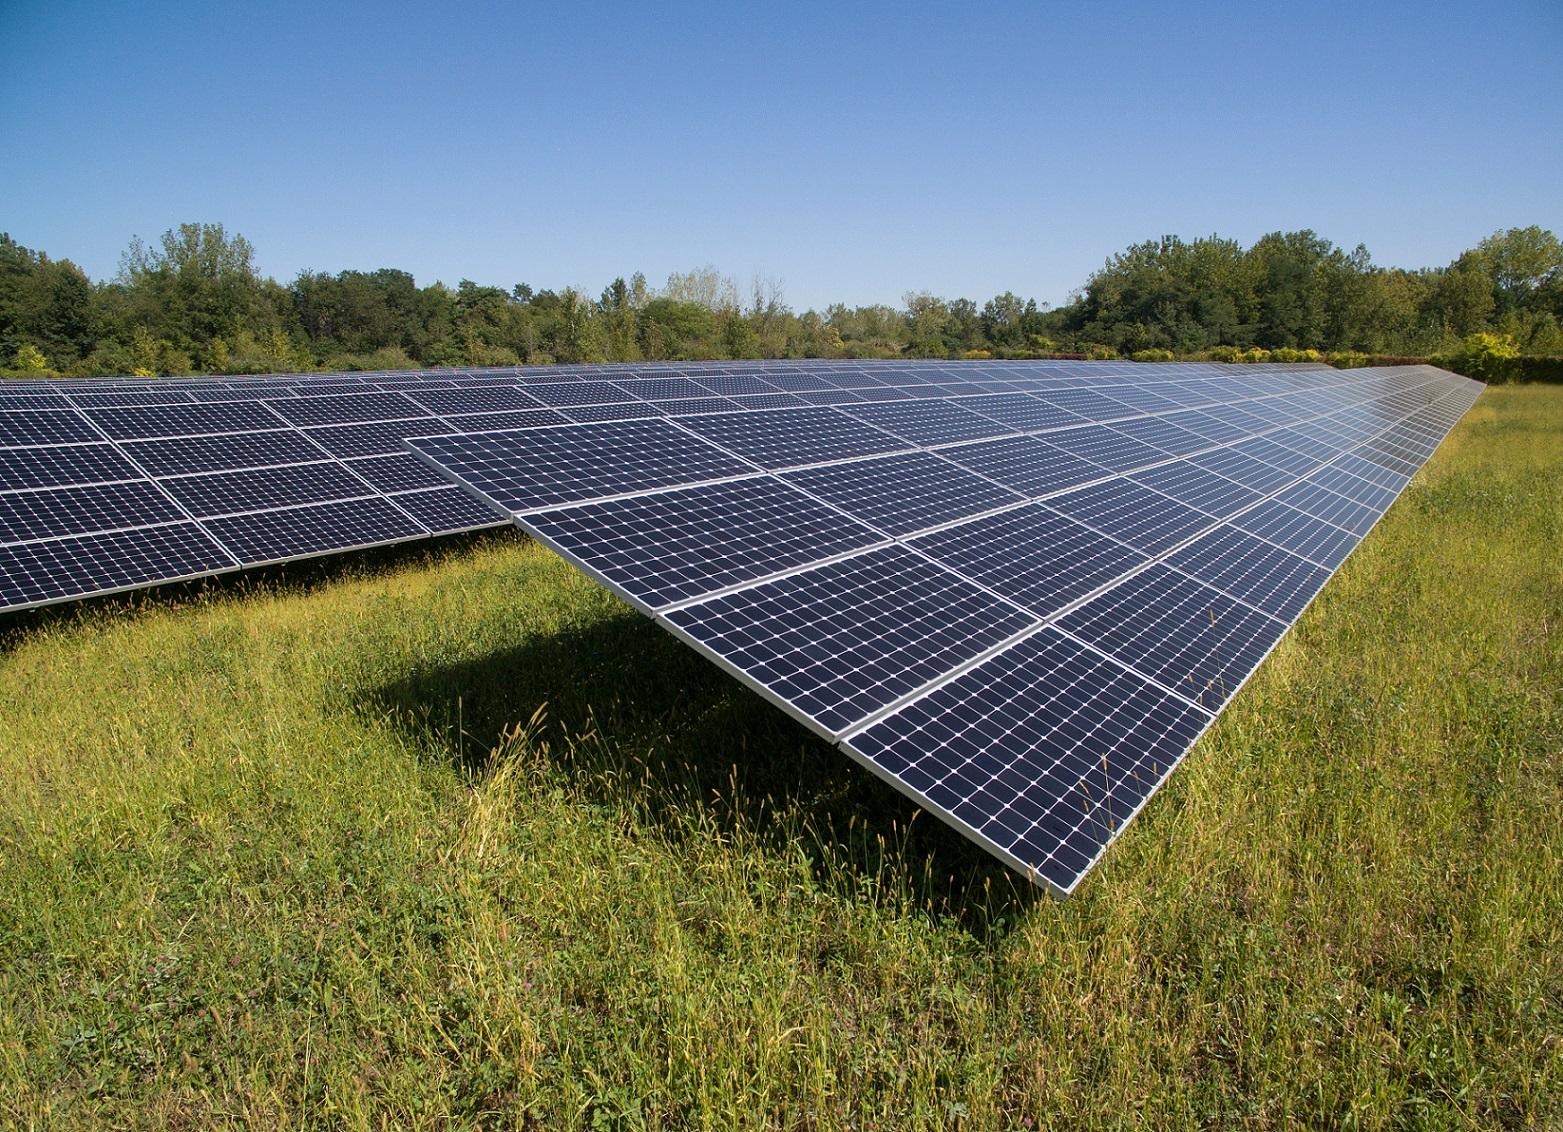 Utility scale solar installation in a grassy field.